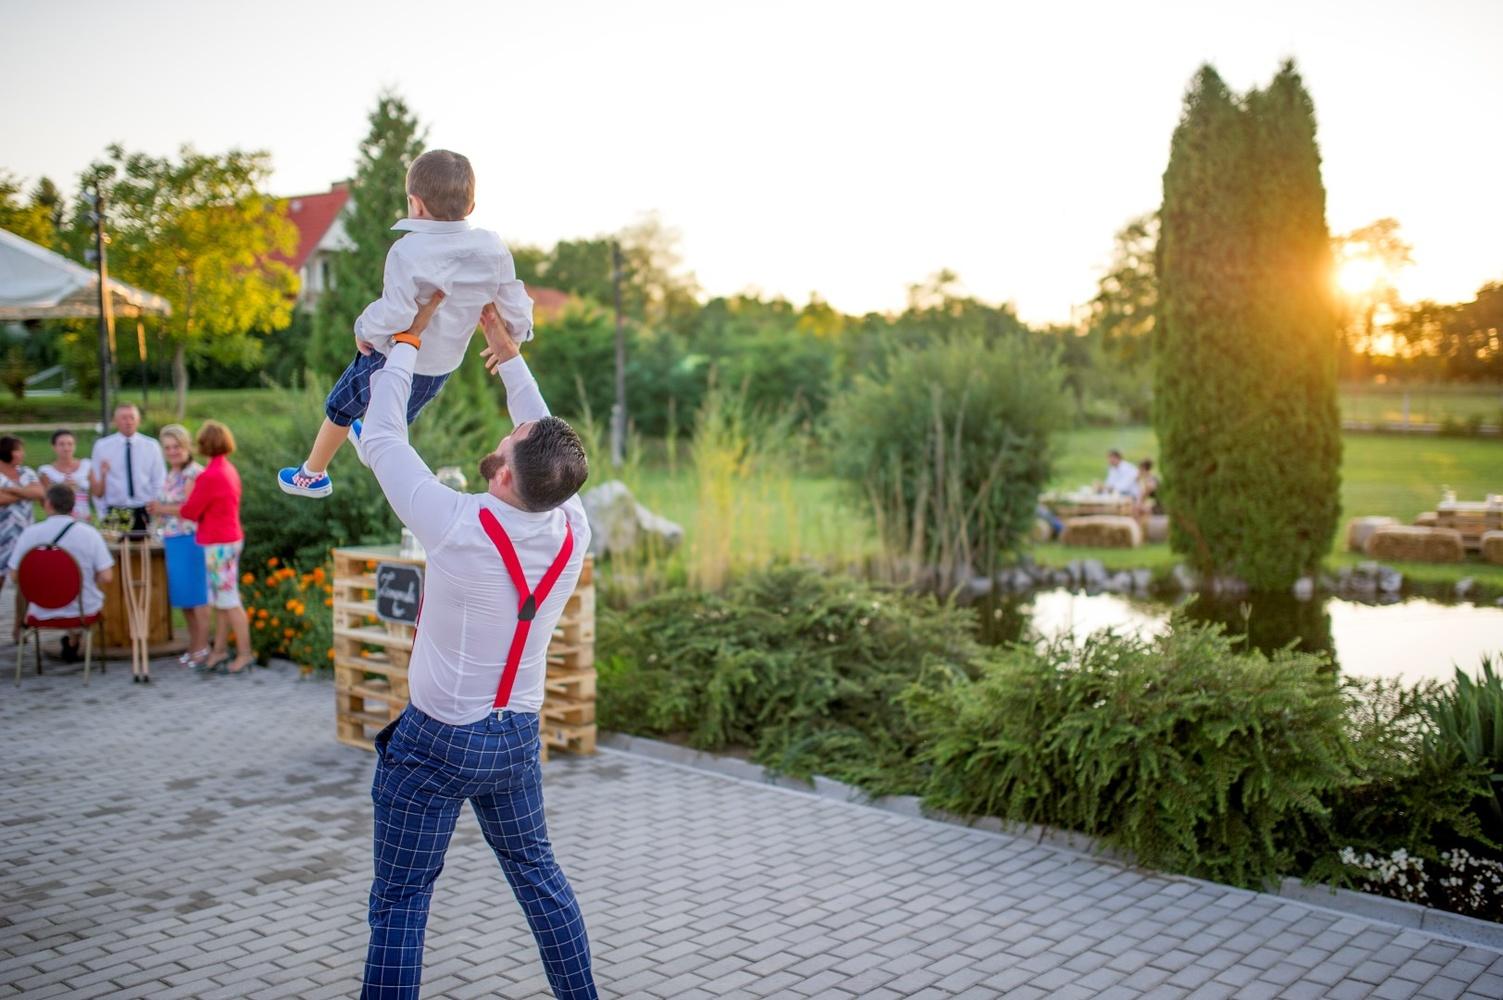 http://www.fotoz.sk/images/gallery-10/normal/eskuvoi-fotozas_svadobne-fotenie_761.jpg